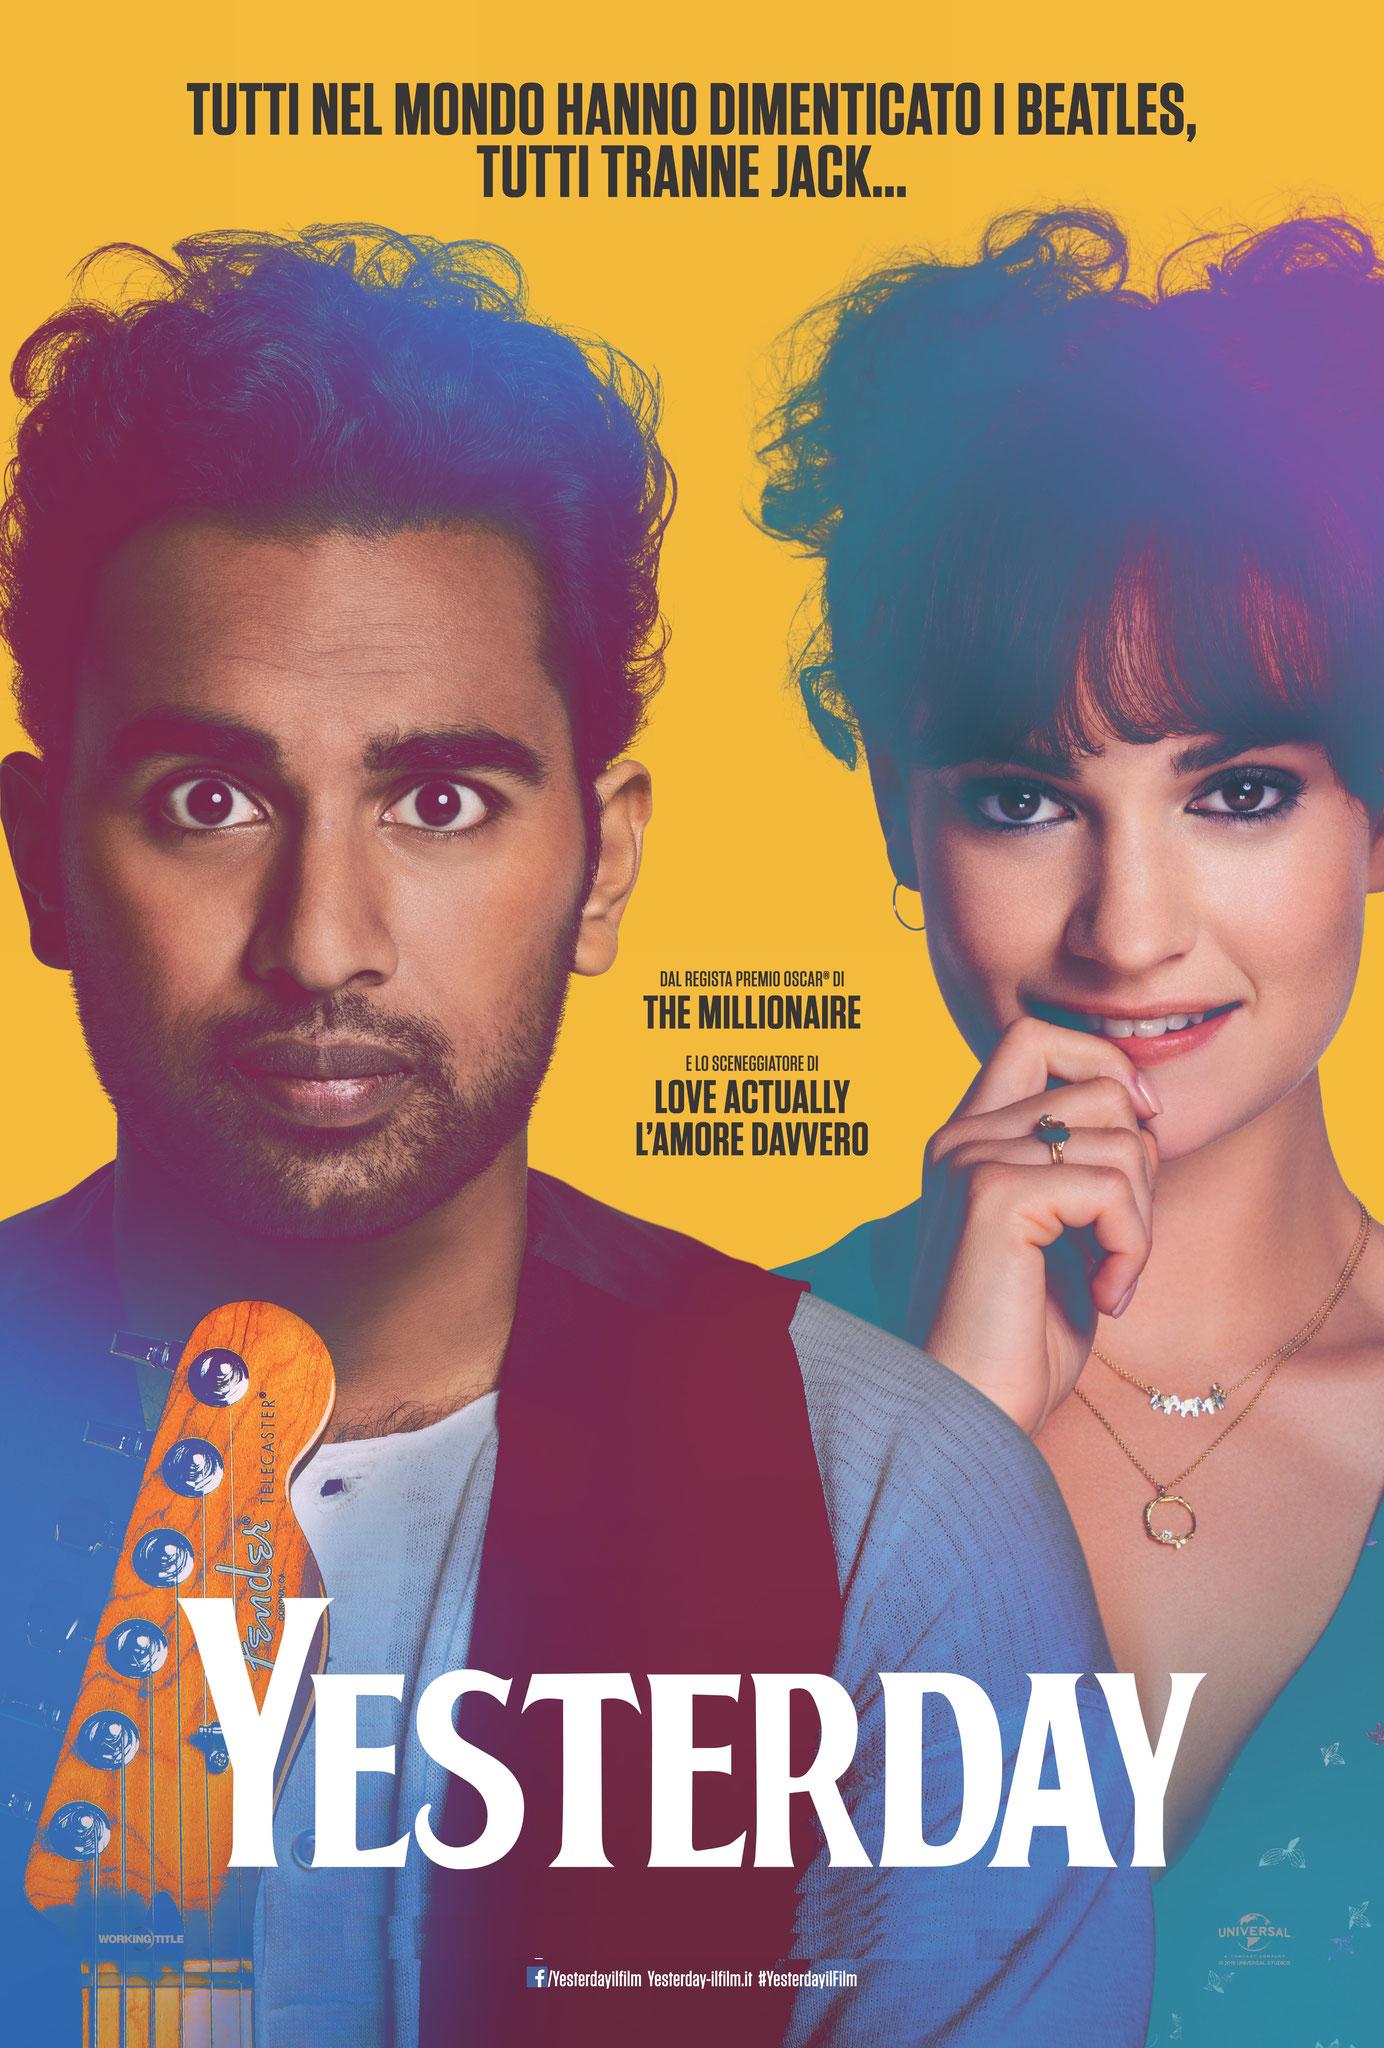 YESTERDAY giovedì 3, venerdì 4, sabato 5, domenica 6: ore 21:15  #YesterdayIlFilm